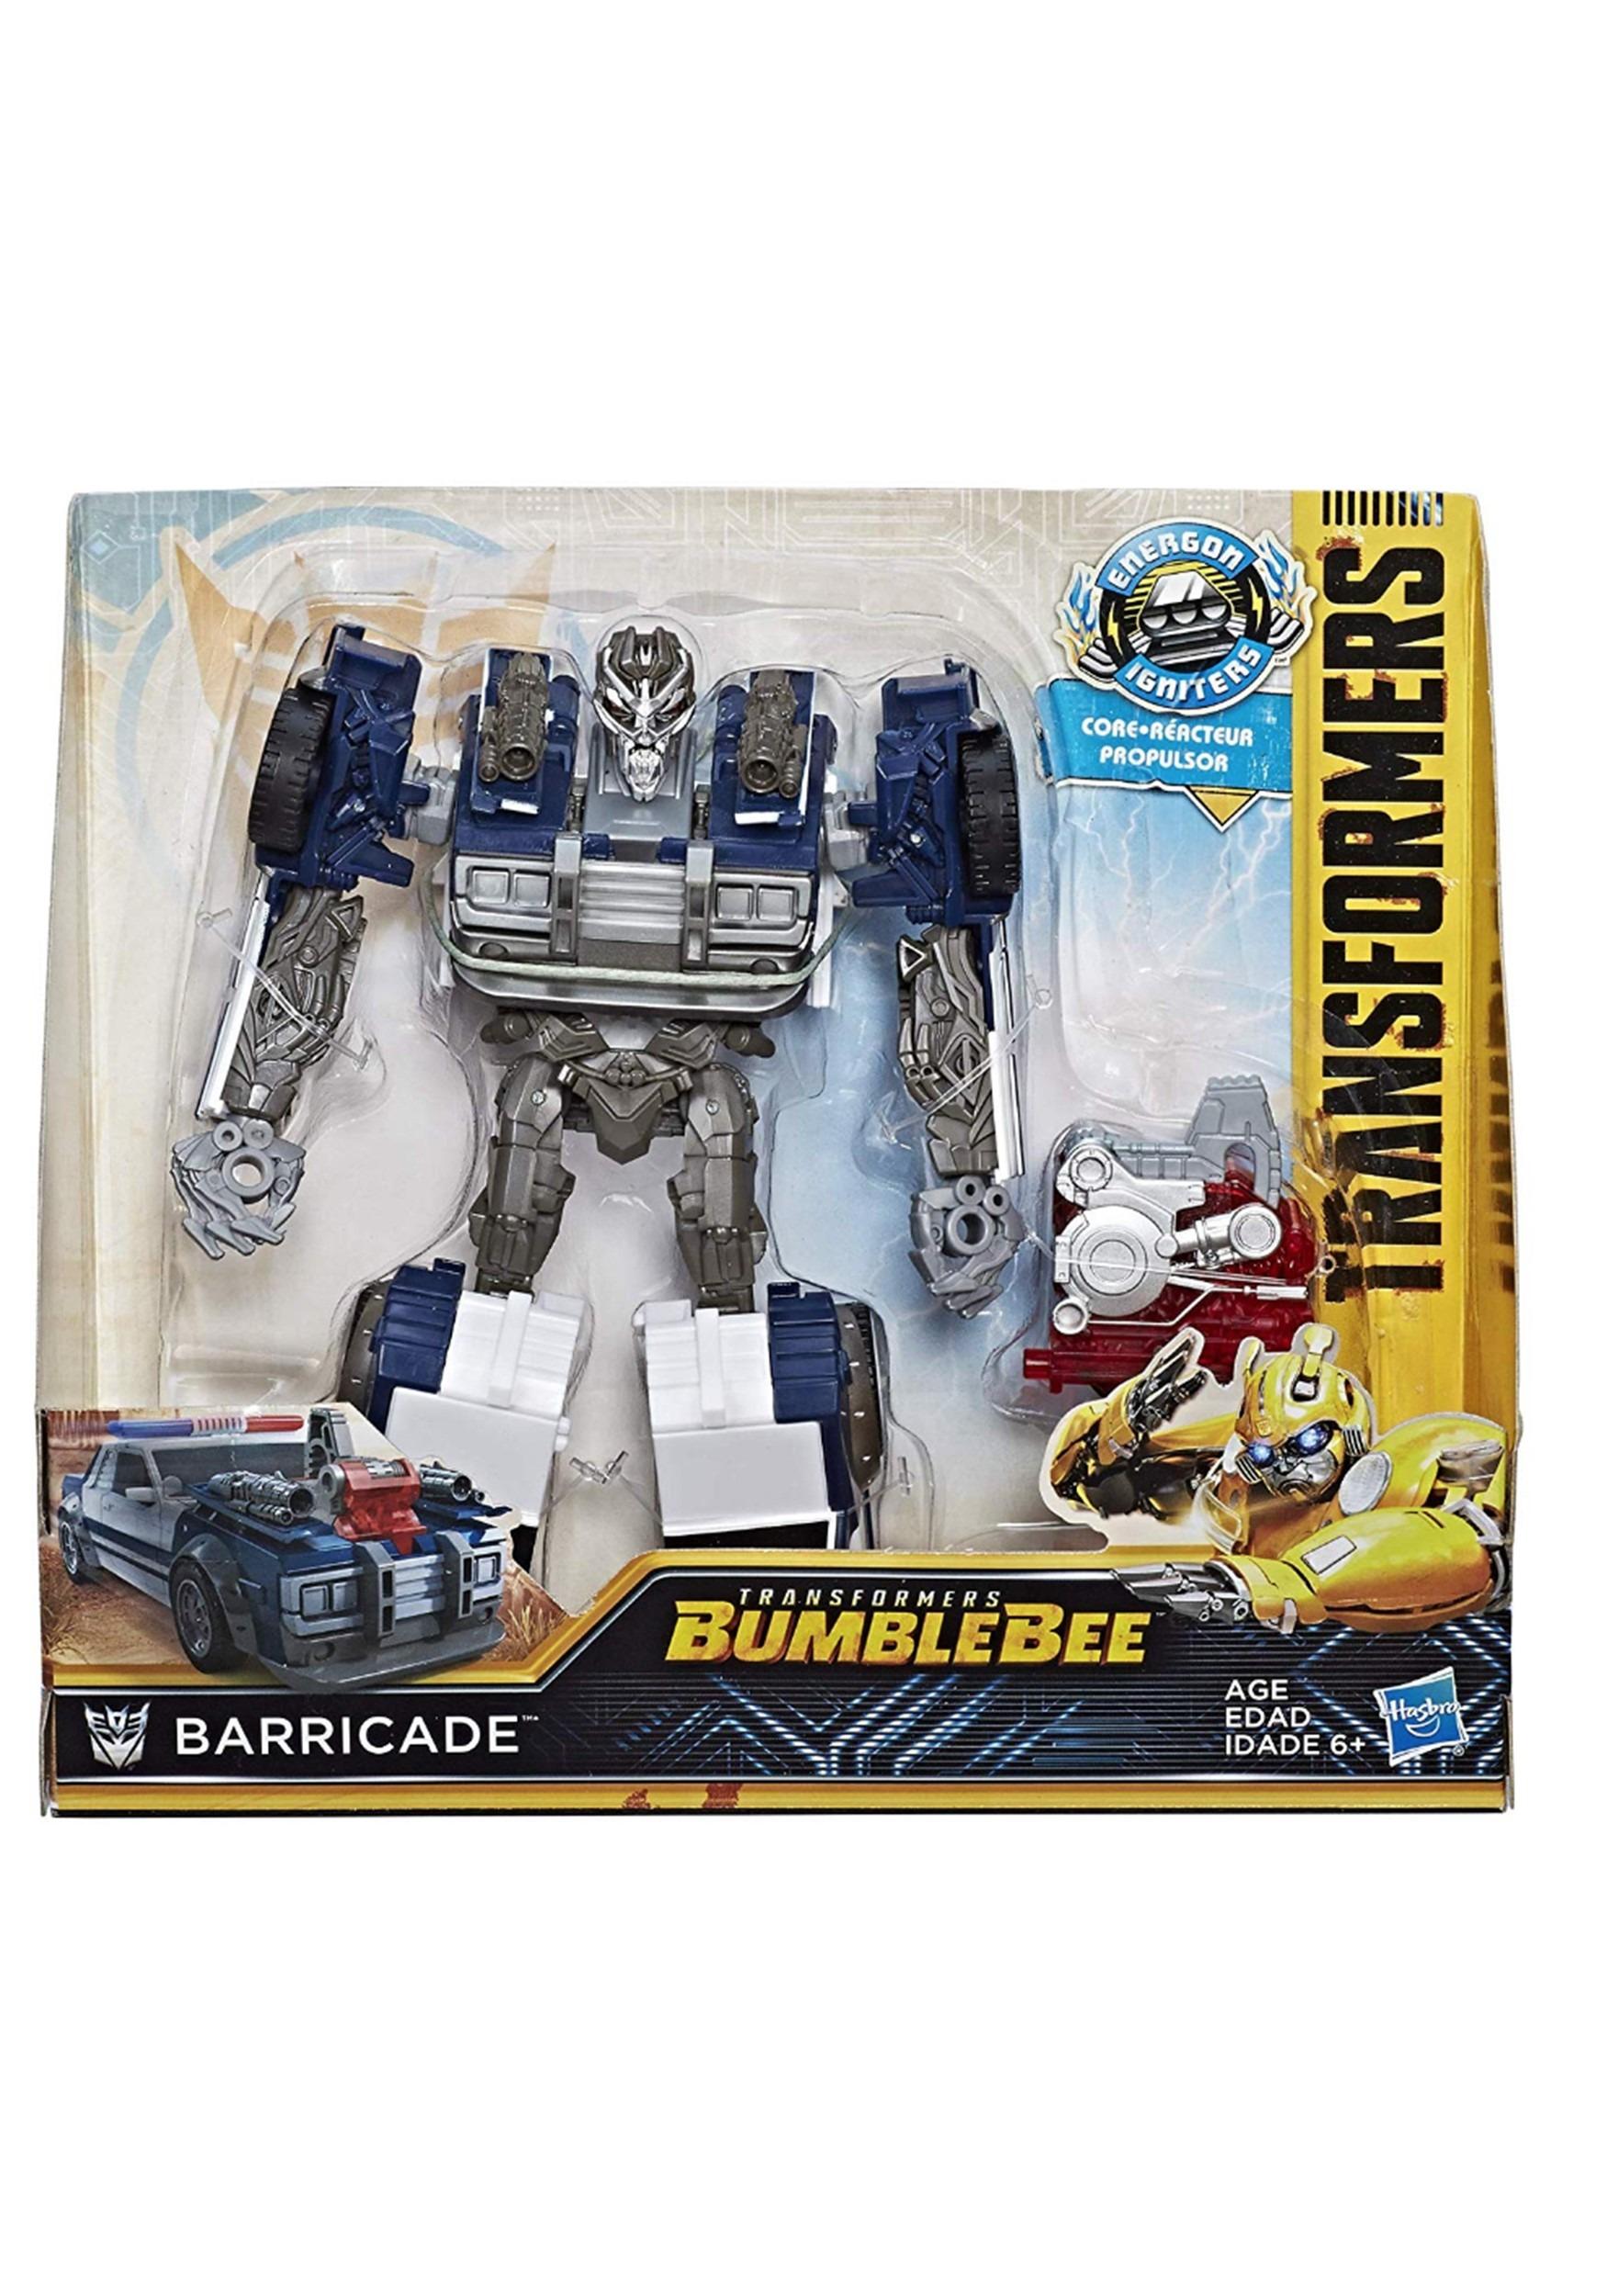 Transformers Bumblebee Energon Igniters Nitro Barricade Action Figure